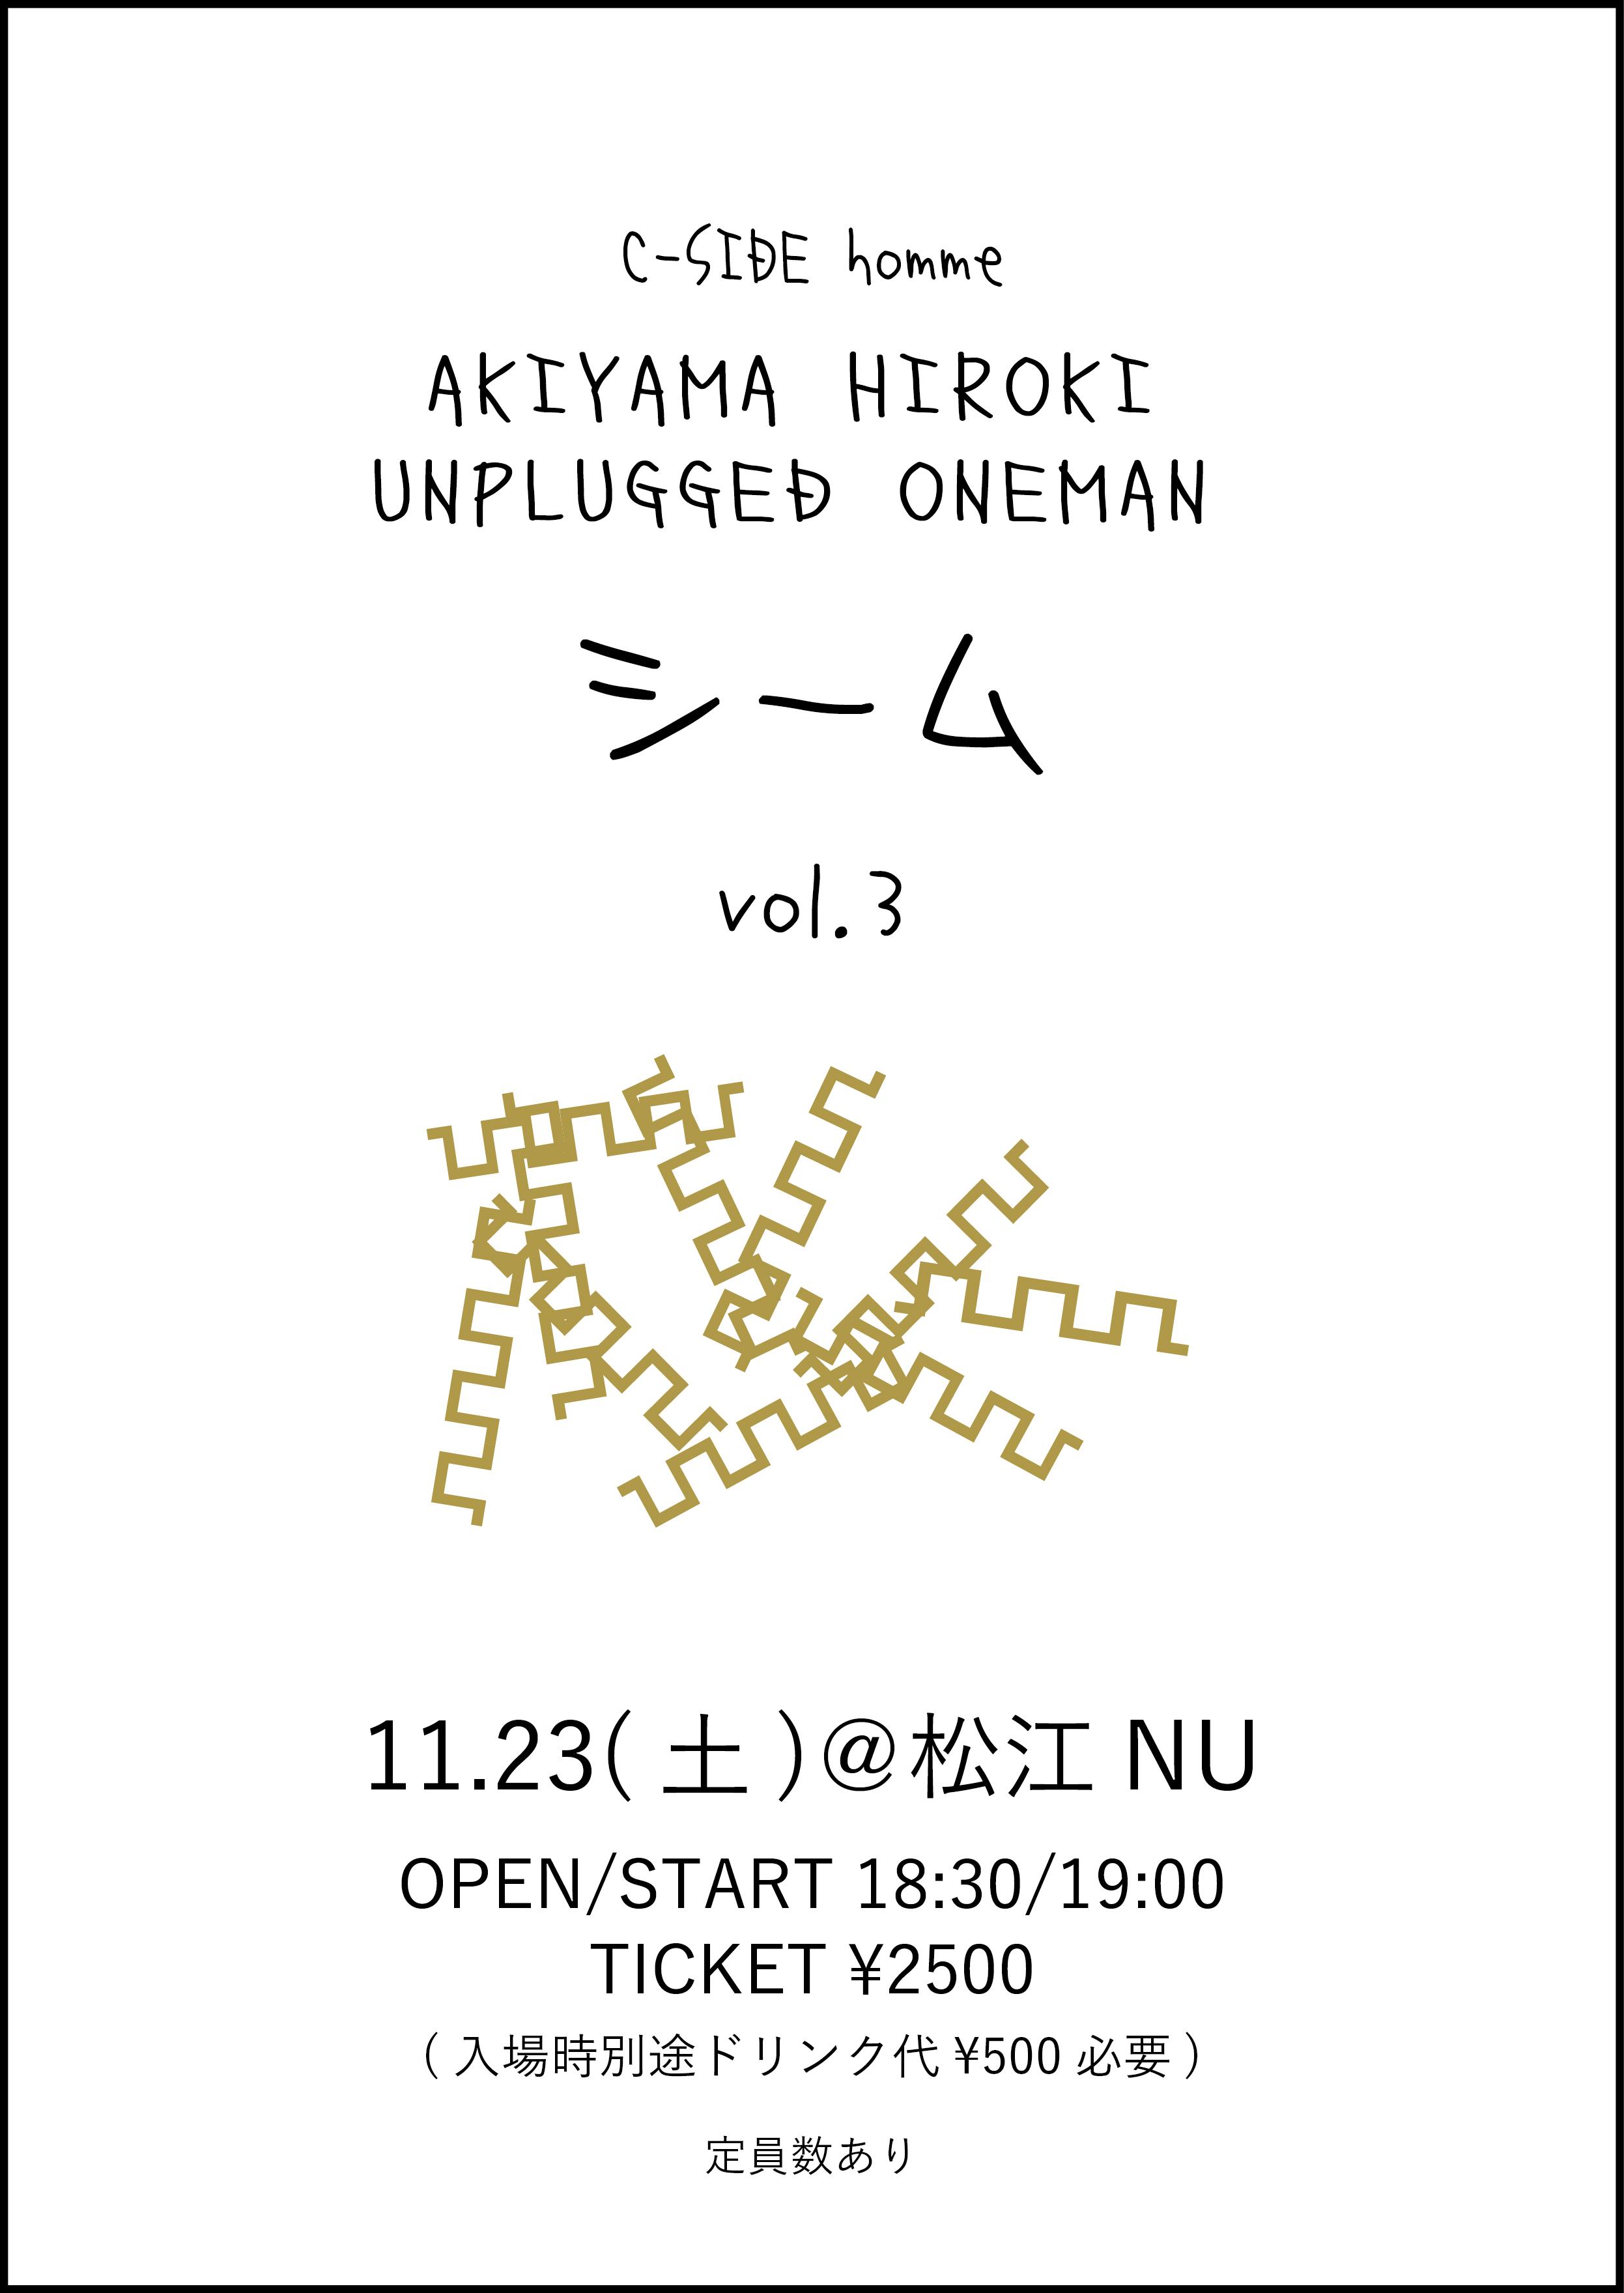 2019年11月23日(土)[シーム]vol.3 @ 松江NU